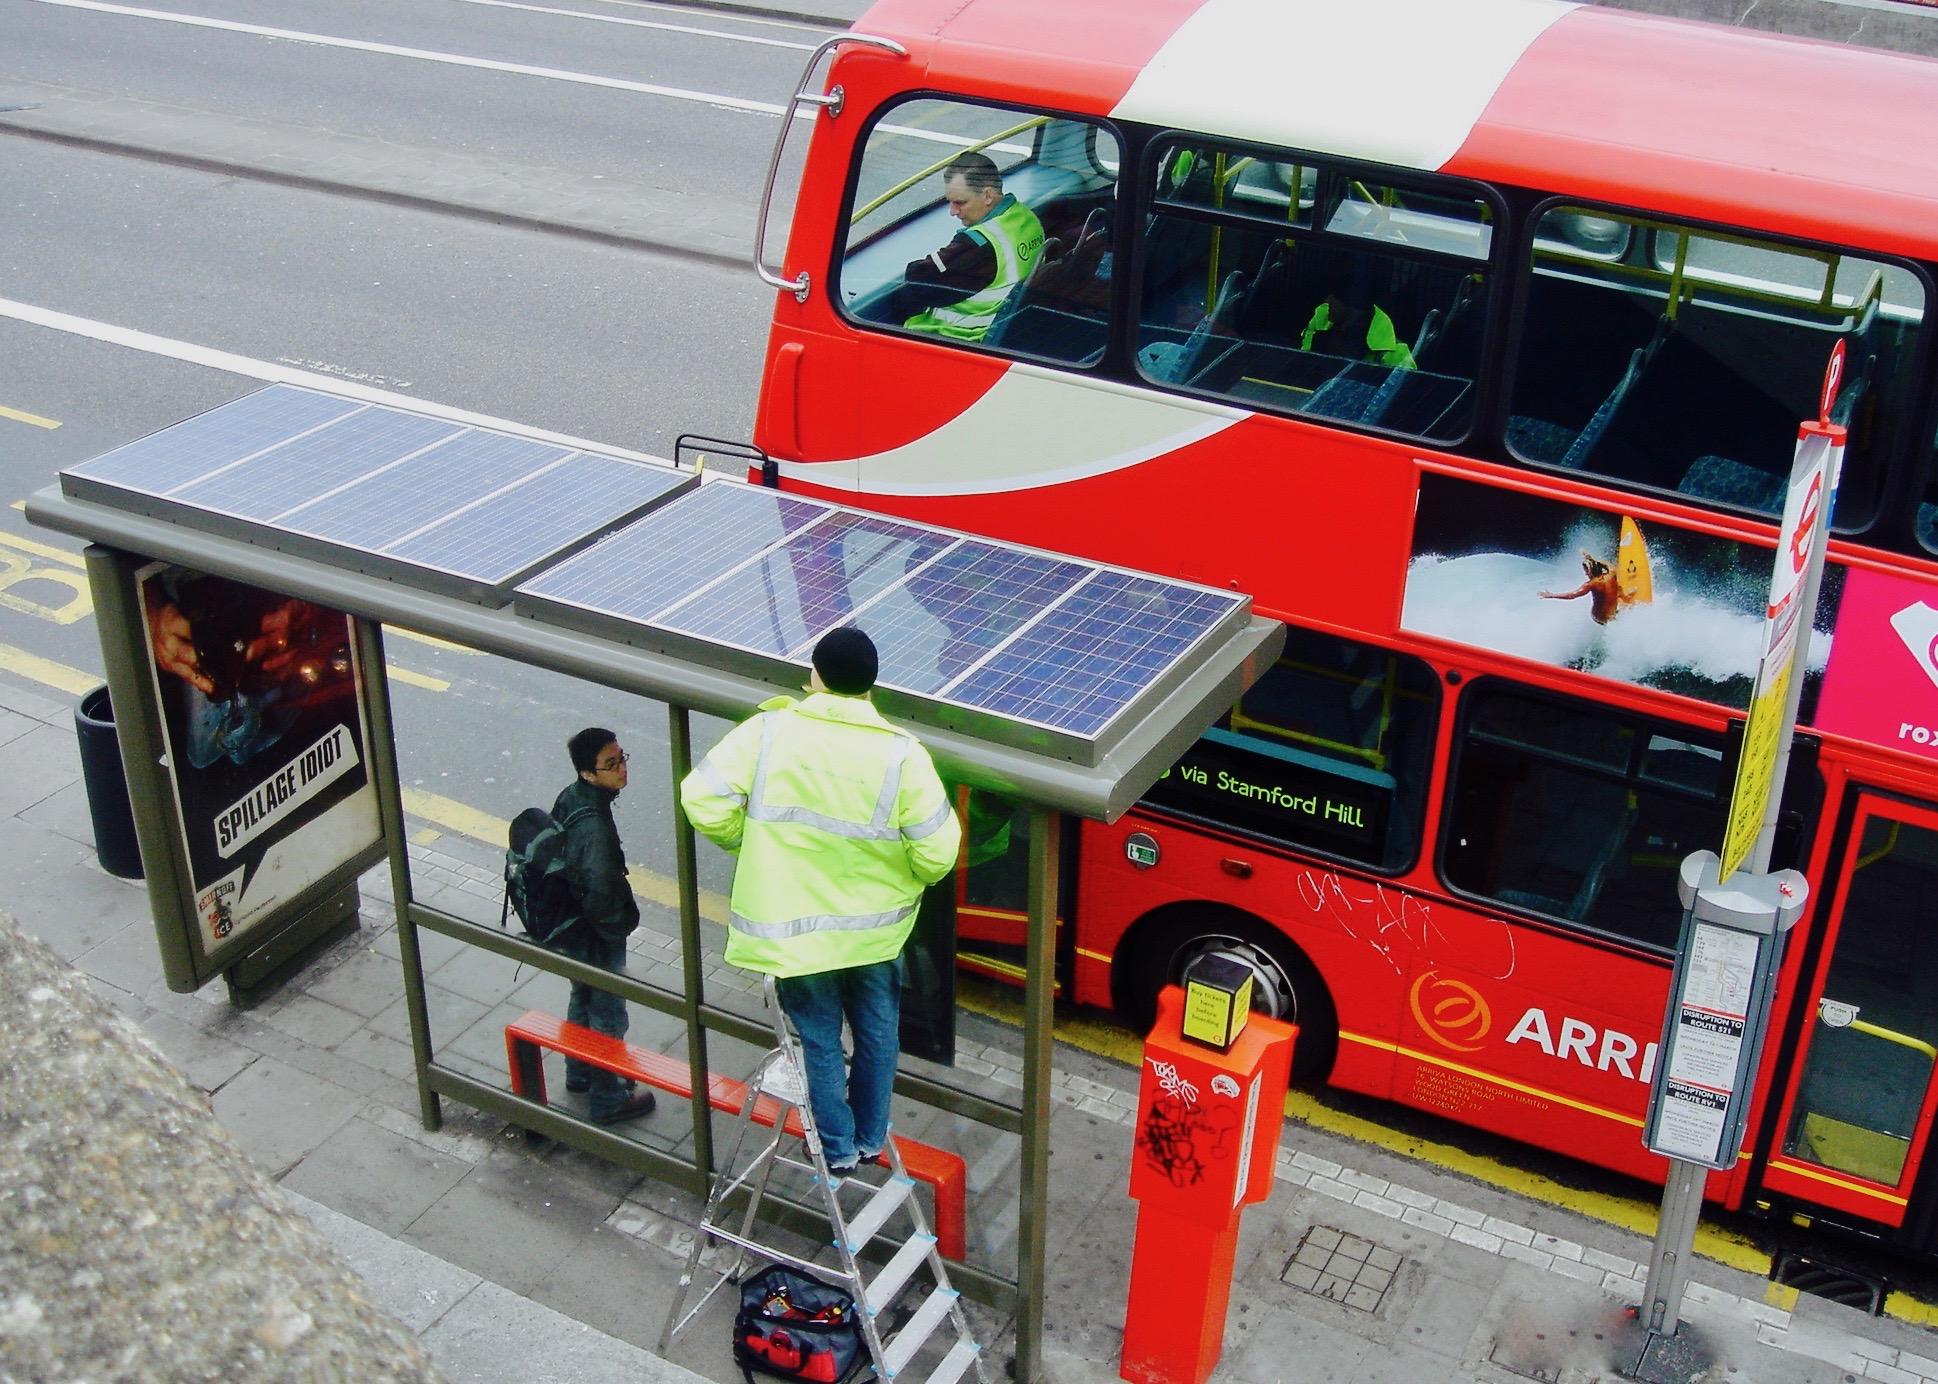 Off-grid bus shelter (London)